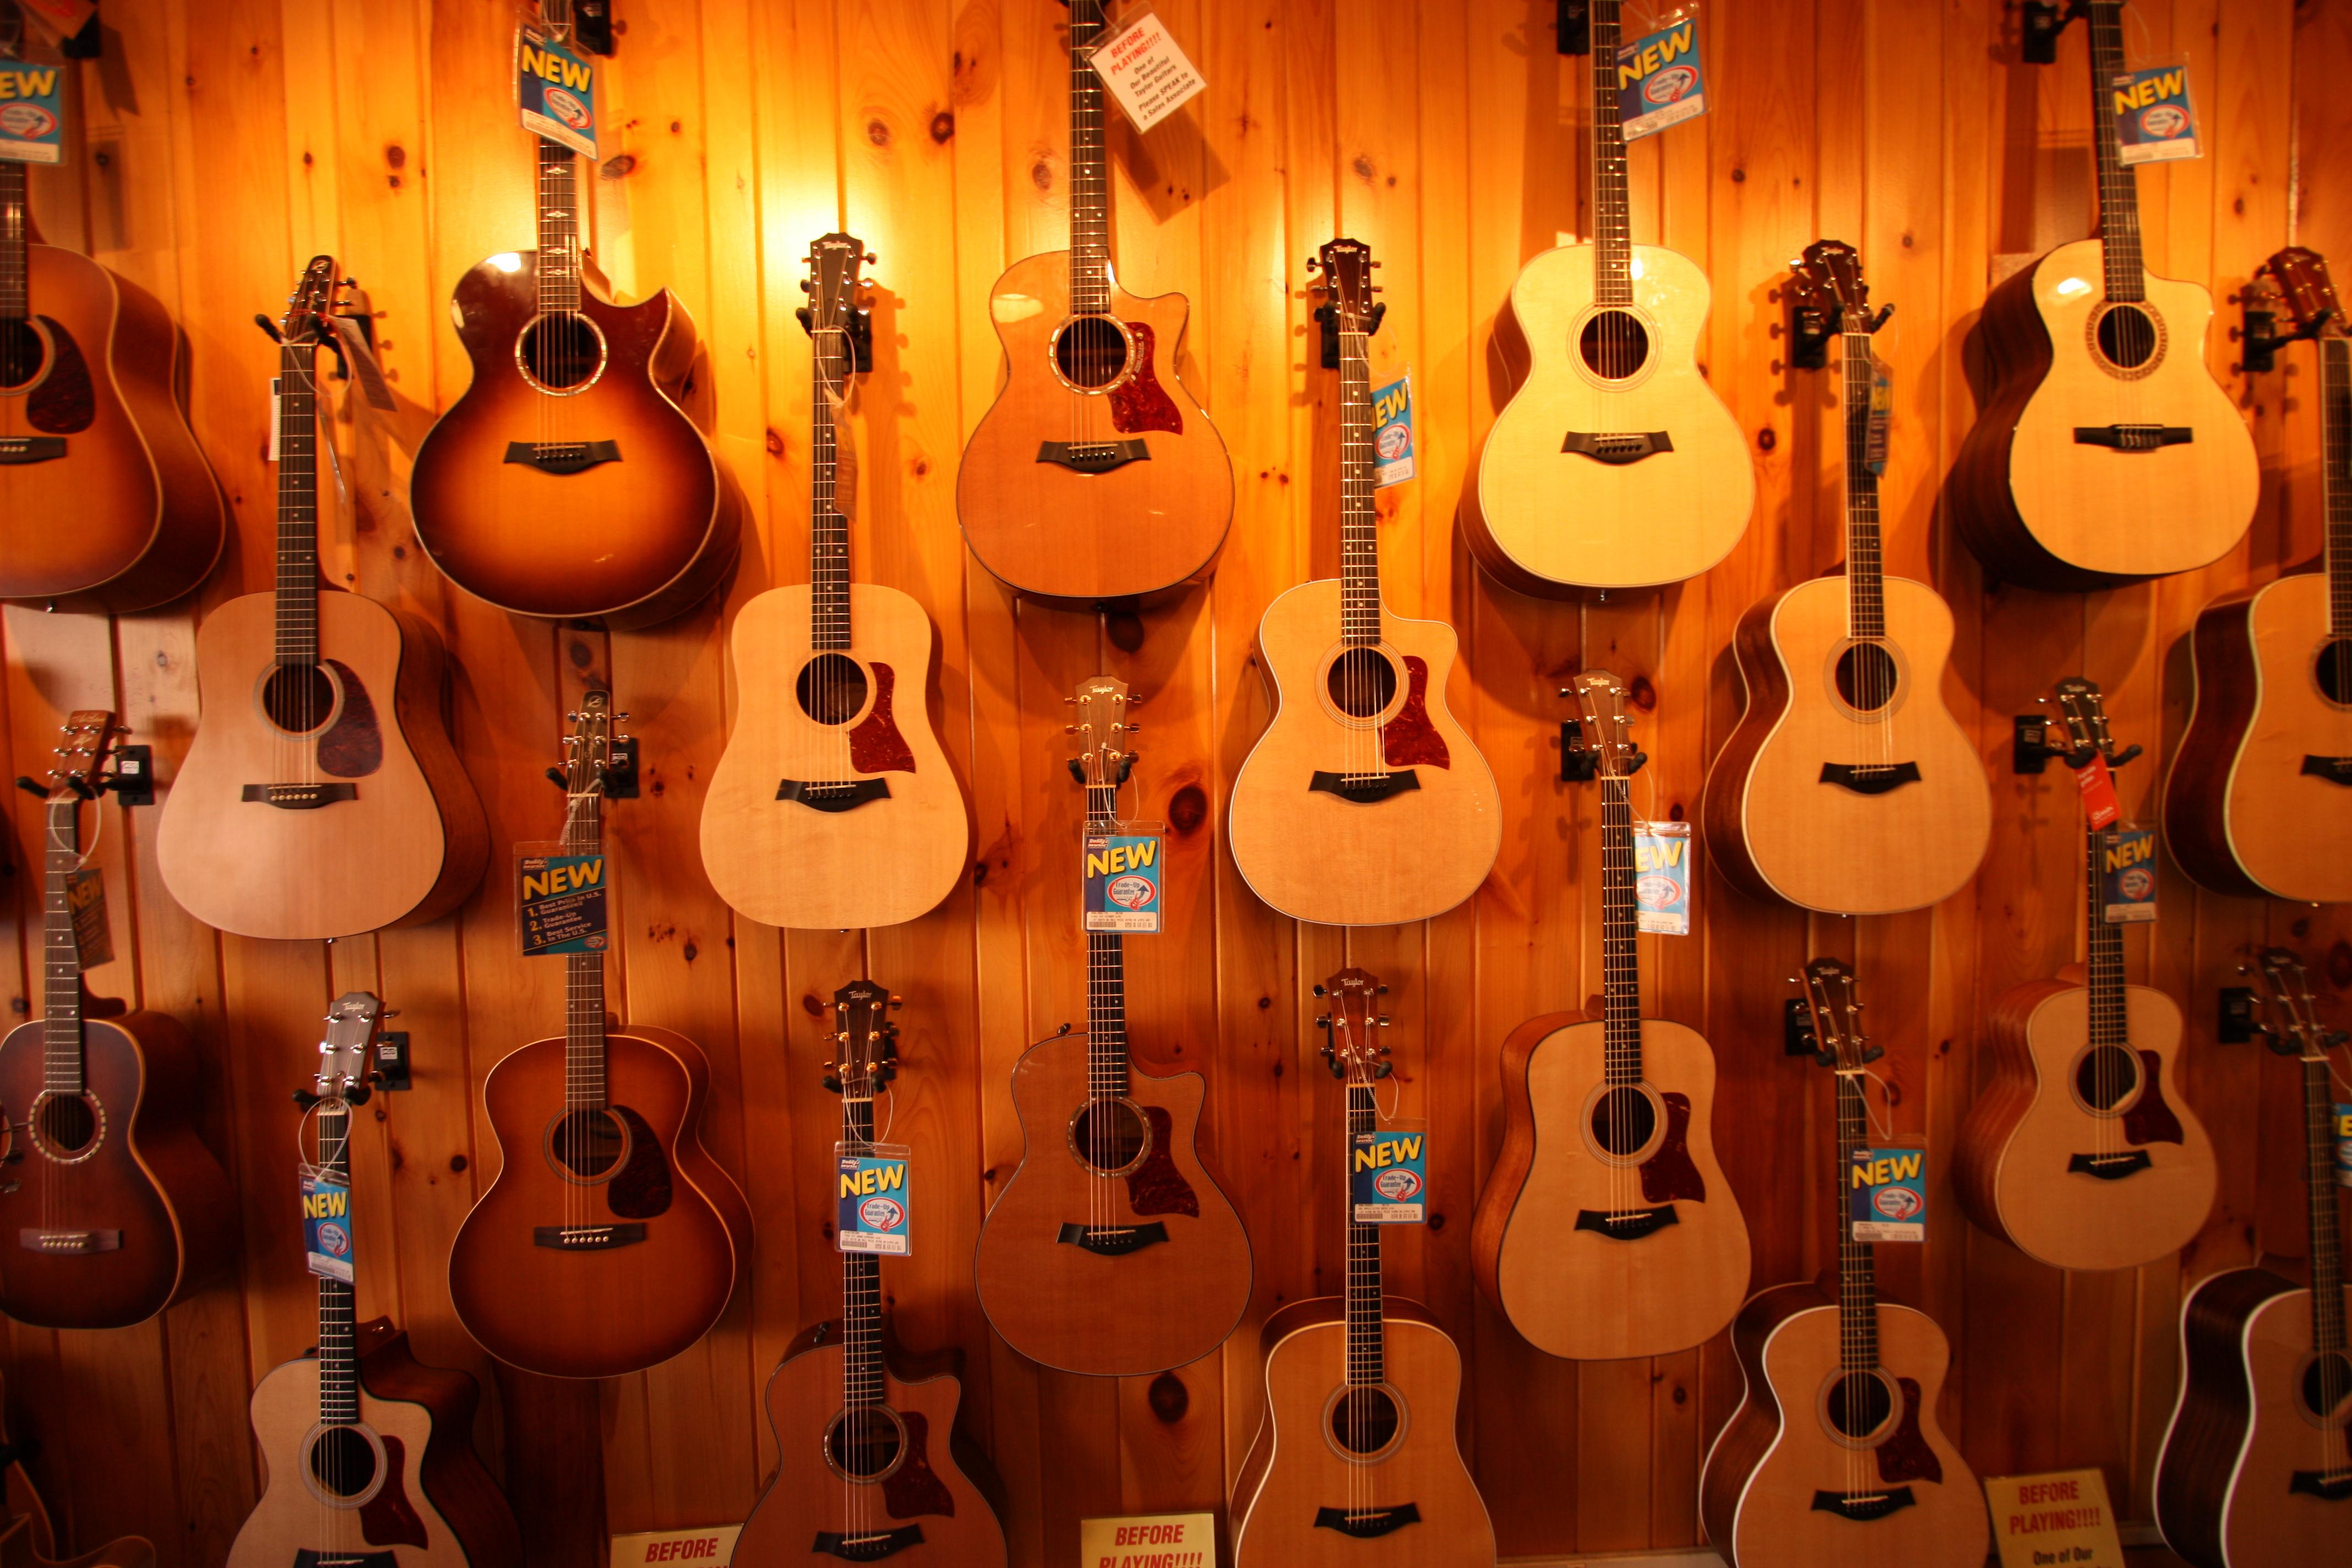 top 10 best acoustic guitars in 2014 reviews itdotng. Black Bedroom Furniture Sets. Home Design Ideas